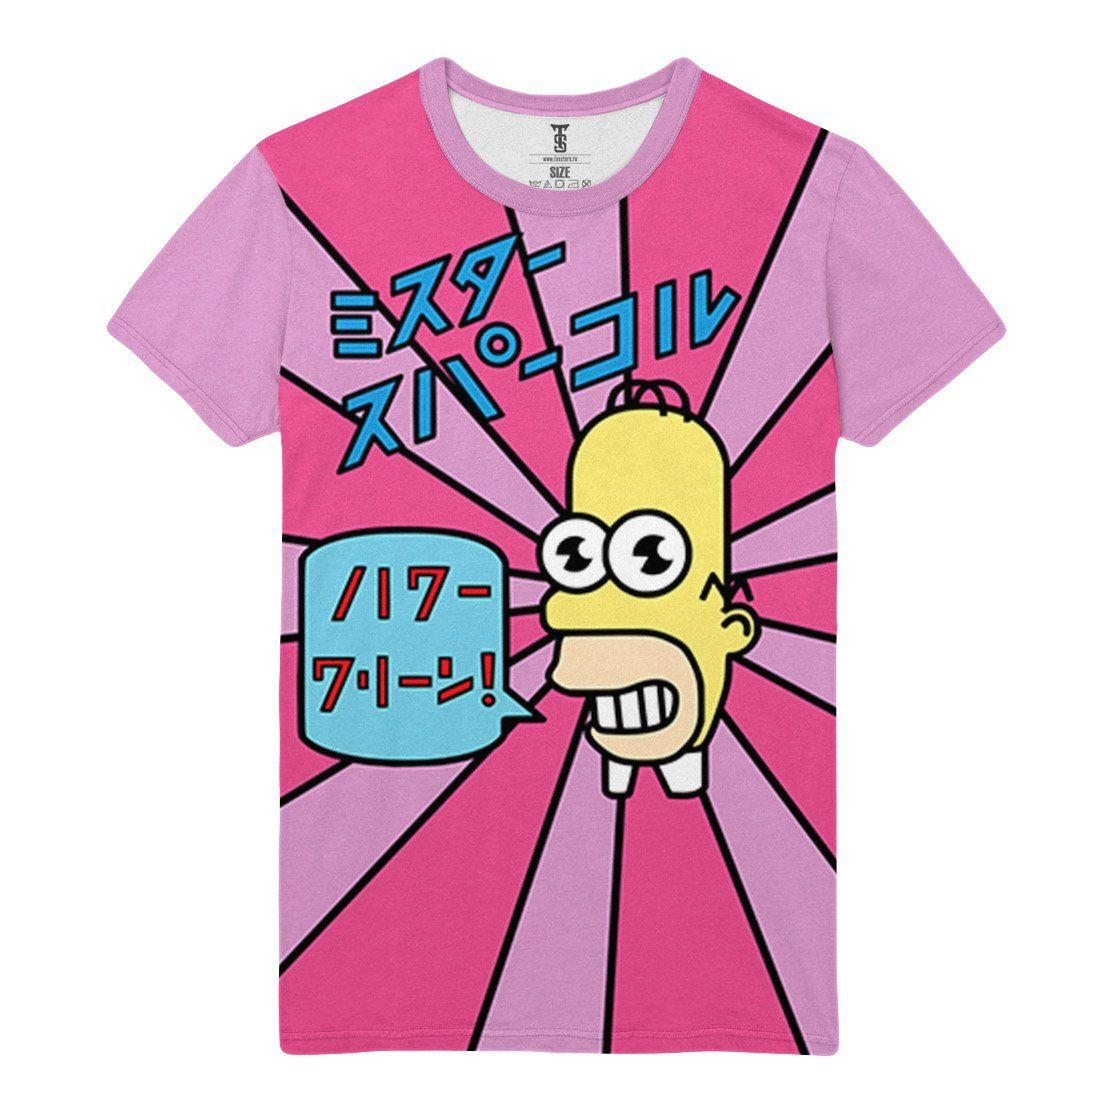 e611245409 Awesome T-shirt Mr Sparkle Homer Simpson The Simpsons Cartoon – Search  tags: #2XL #3XL #4XL #5XL #amazon #Apparels #australia #boy #buy #ebay  #Female #girls ...